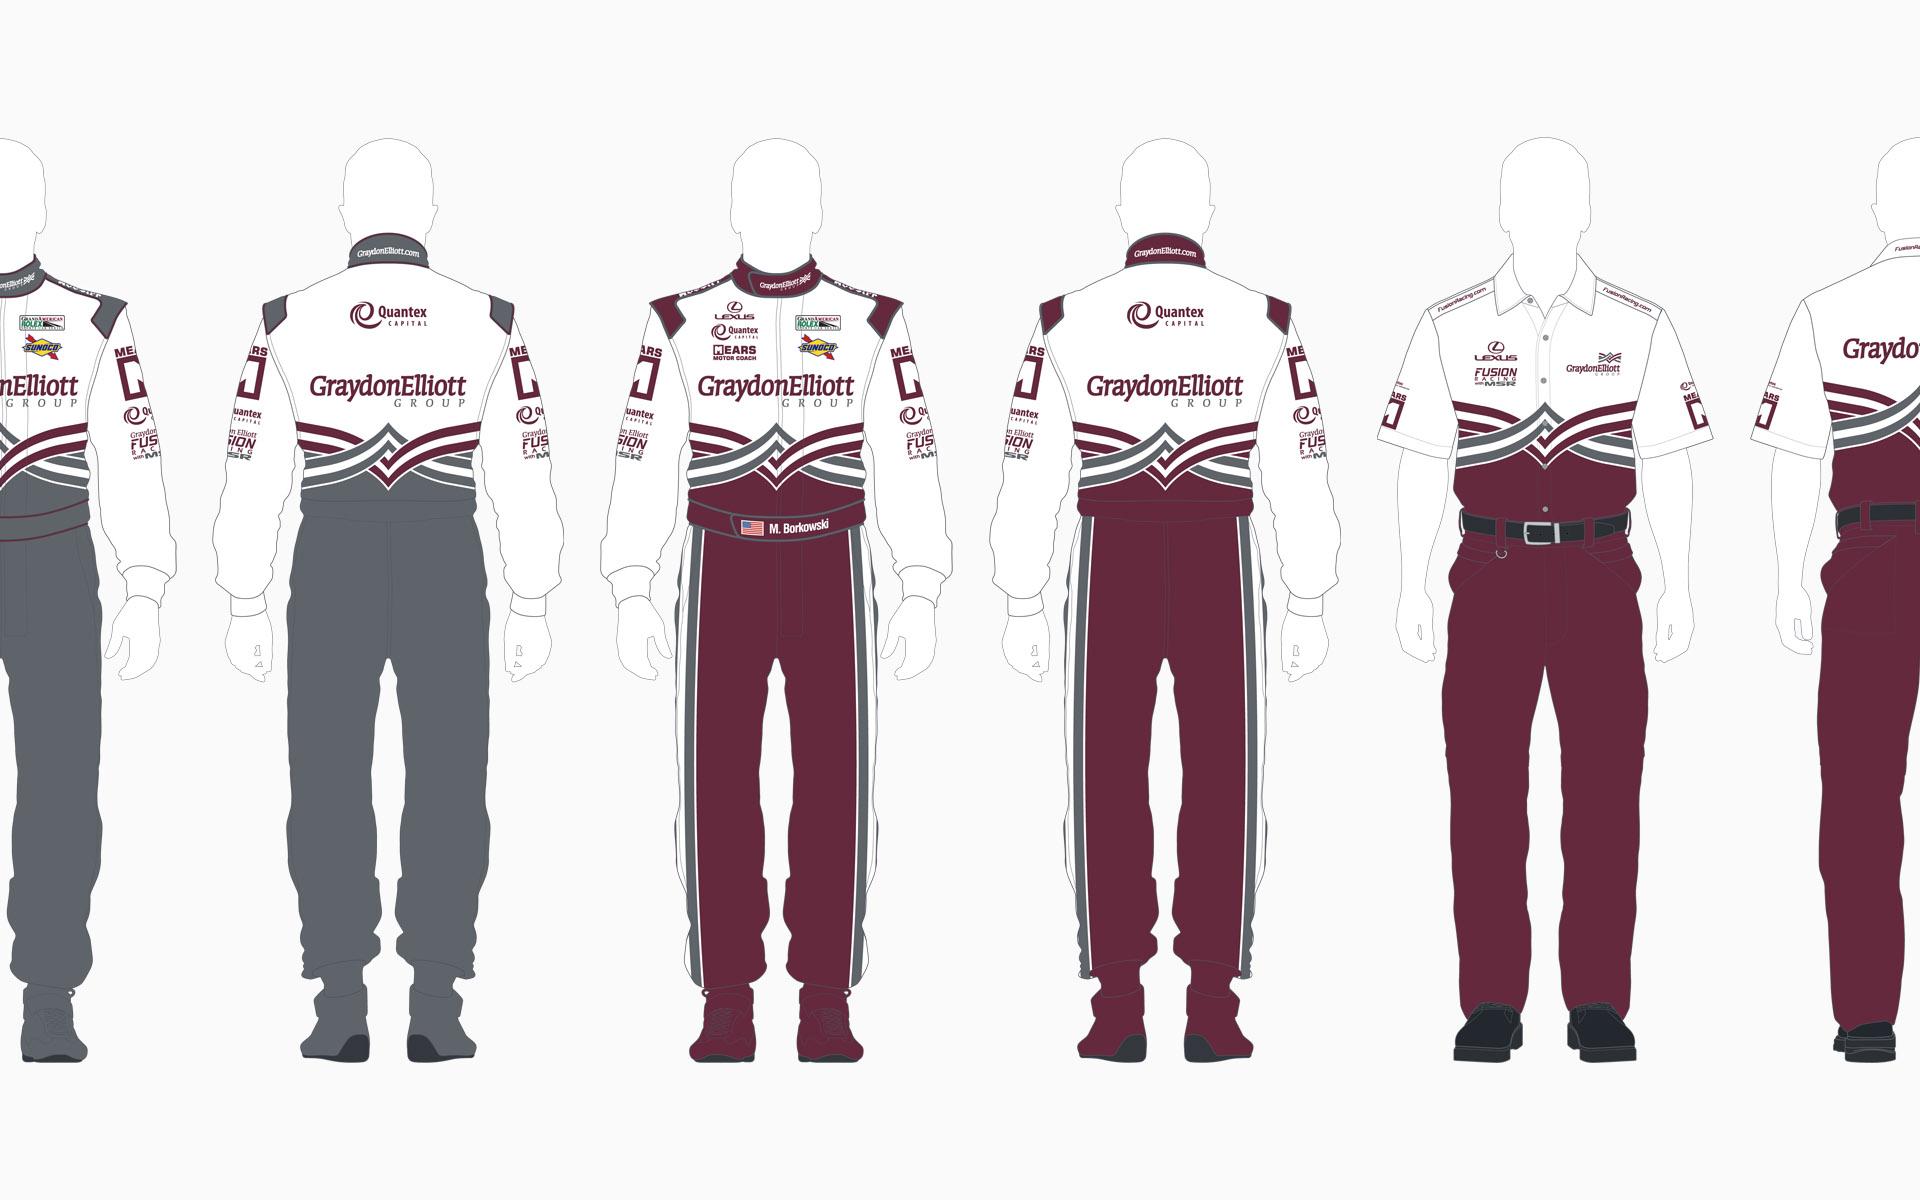 Michael Shank Racing Graydon Elliott Crew Shirt and Firesuit